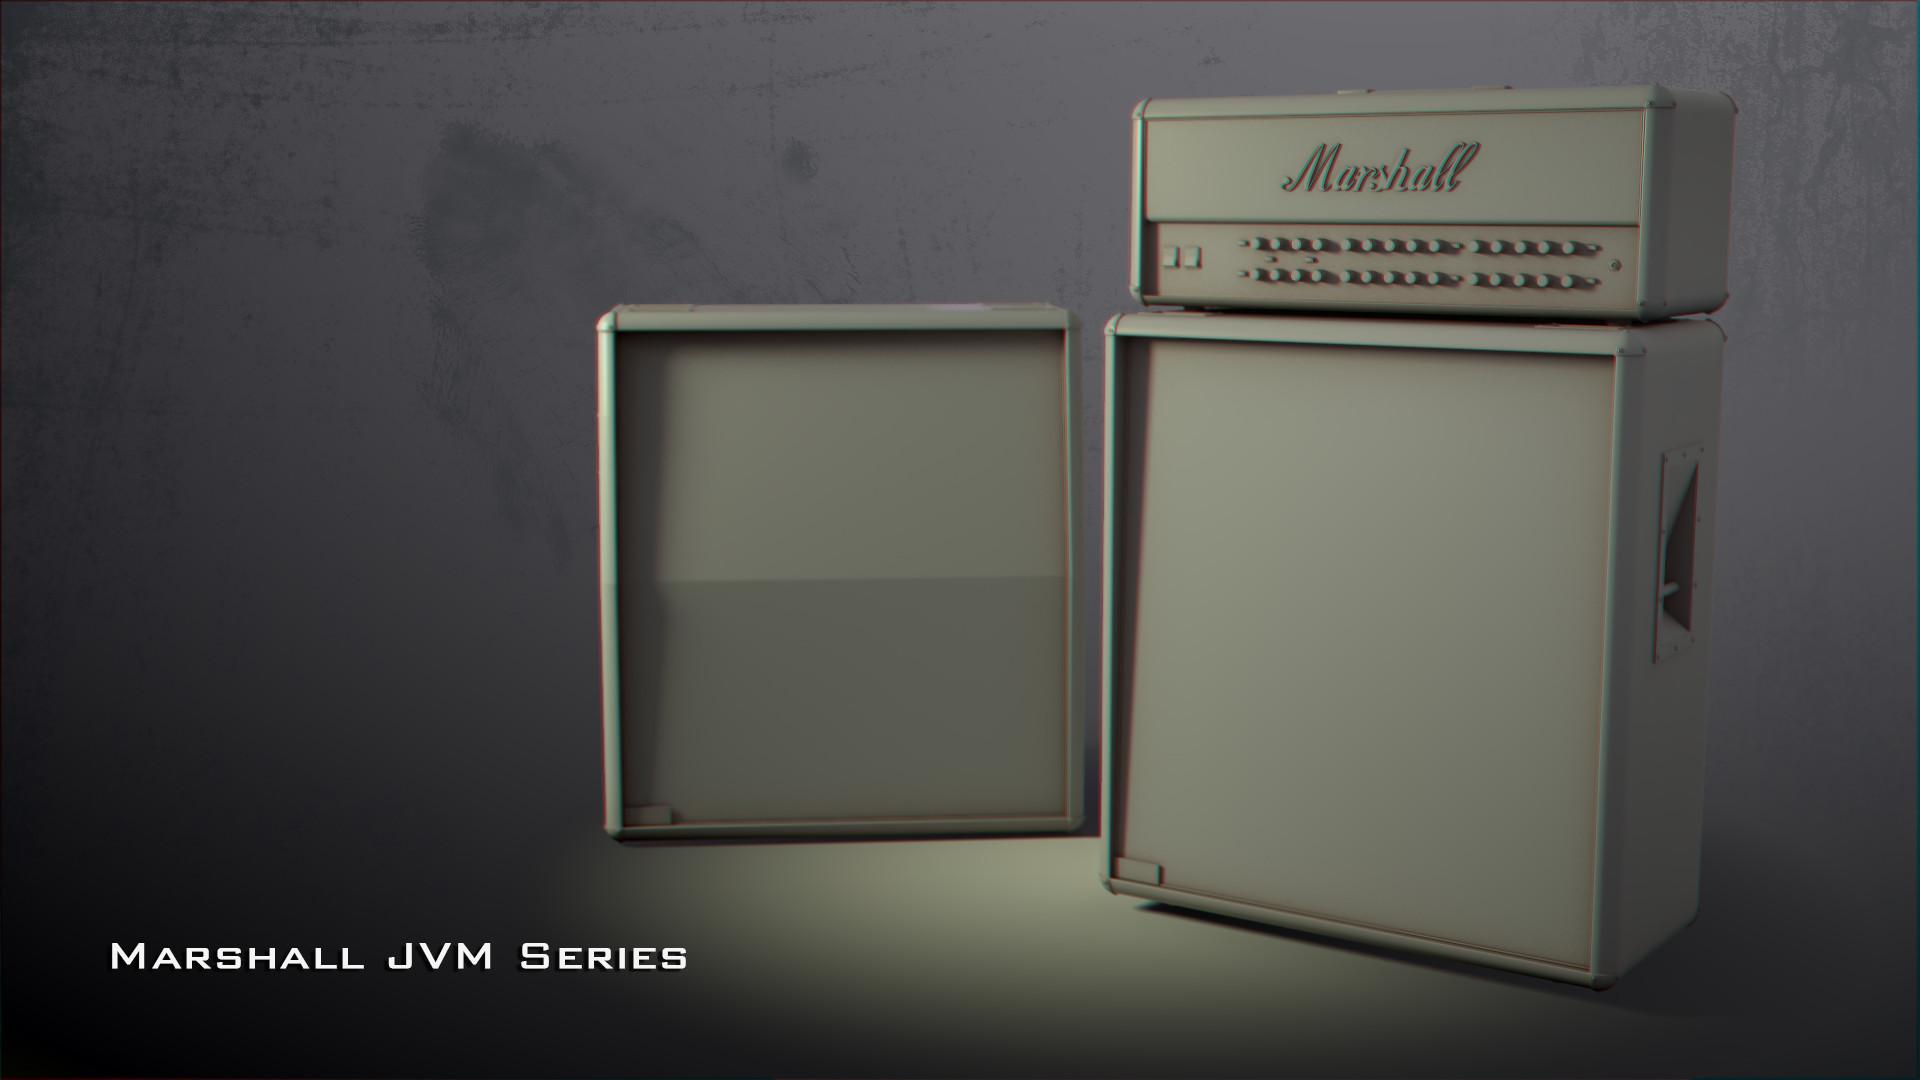 Marshall Amp. Advertisements